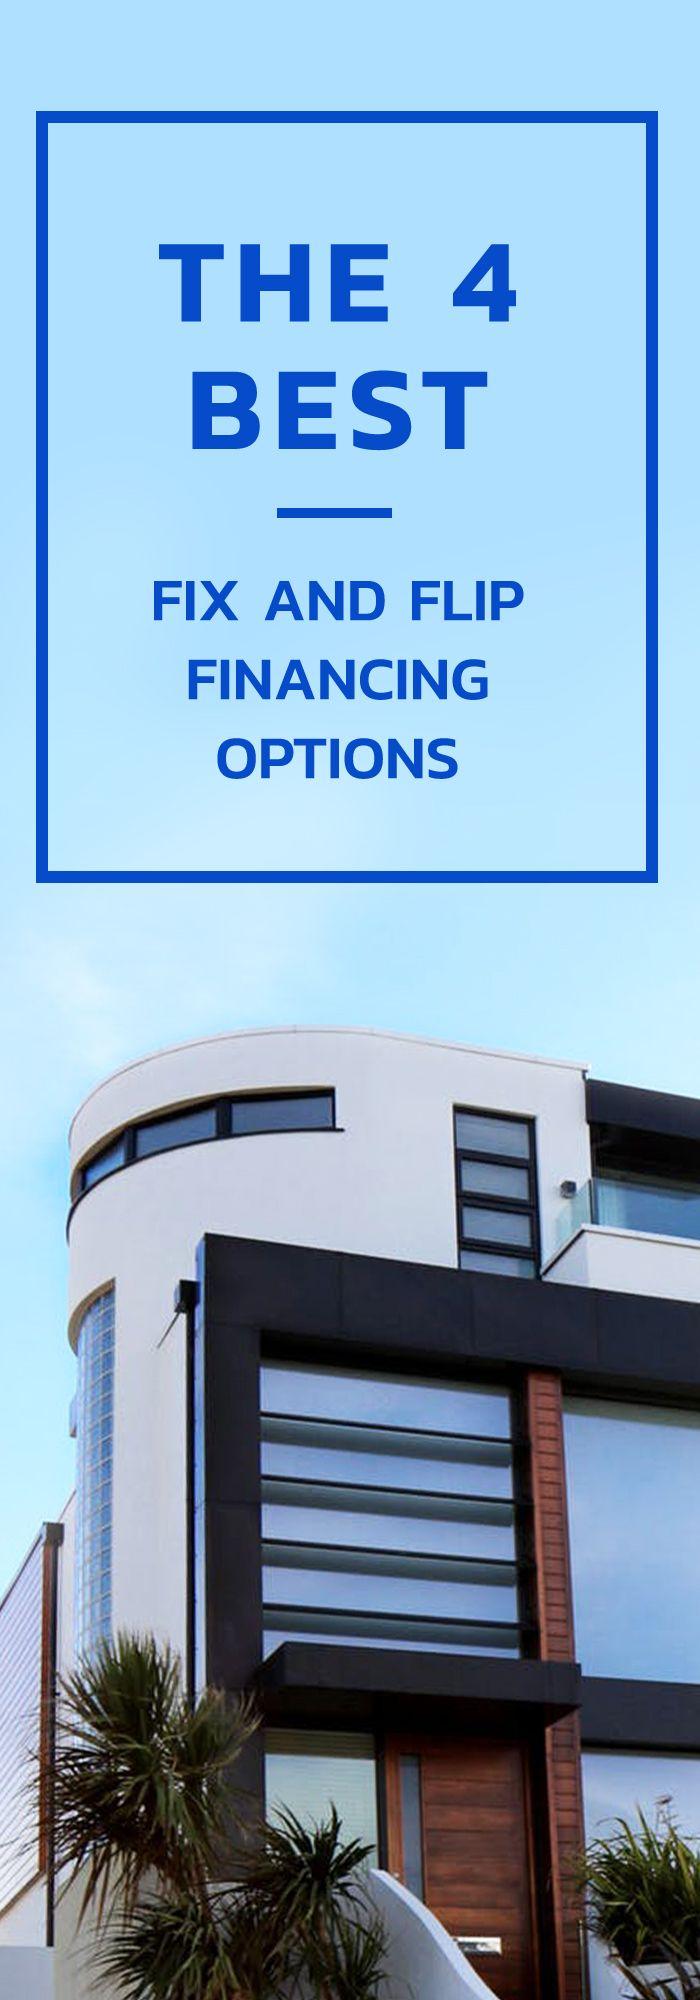 Fix and Flip Loans The 4 Best FixandFlip Financing